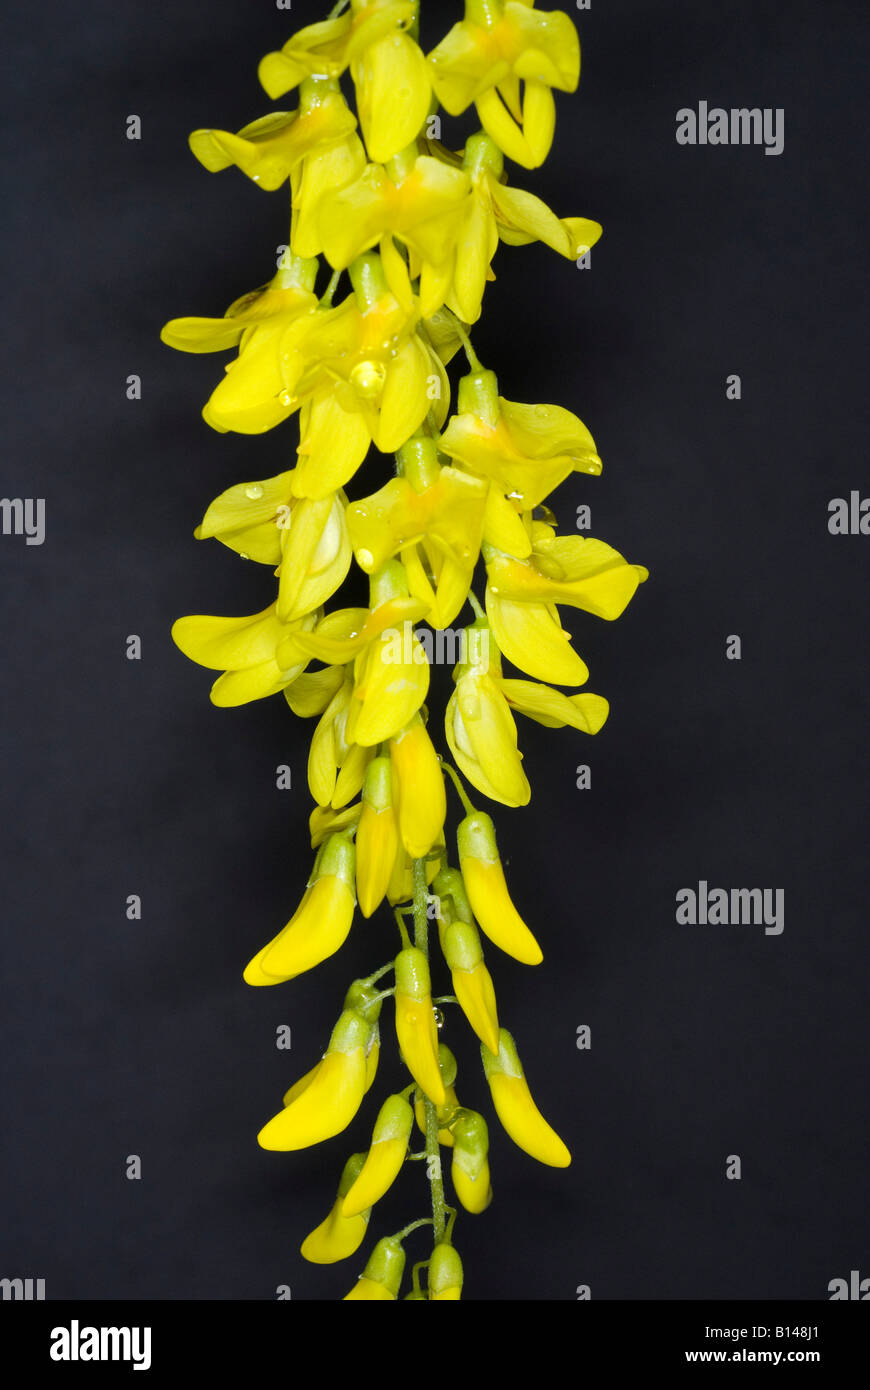 Yellow flowers of laburnum also called golden chain stock photo yellow flowers of laburnum also called golden chain mightylinksfo